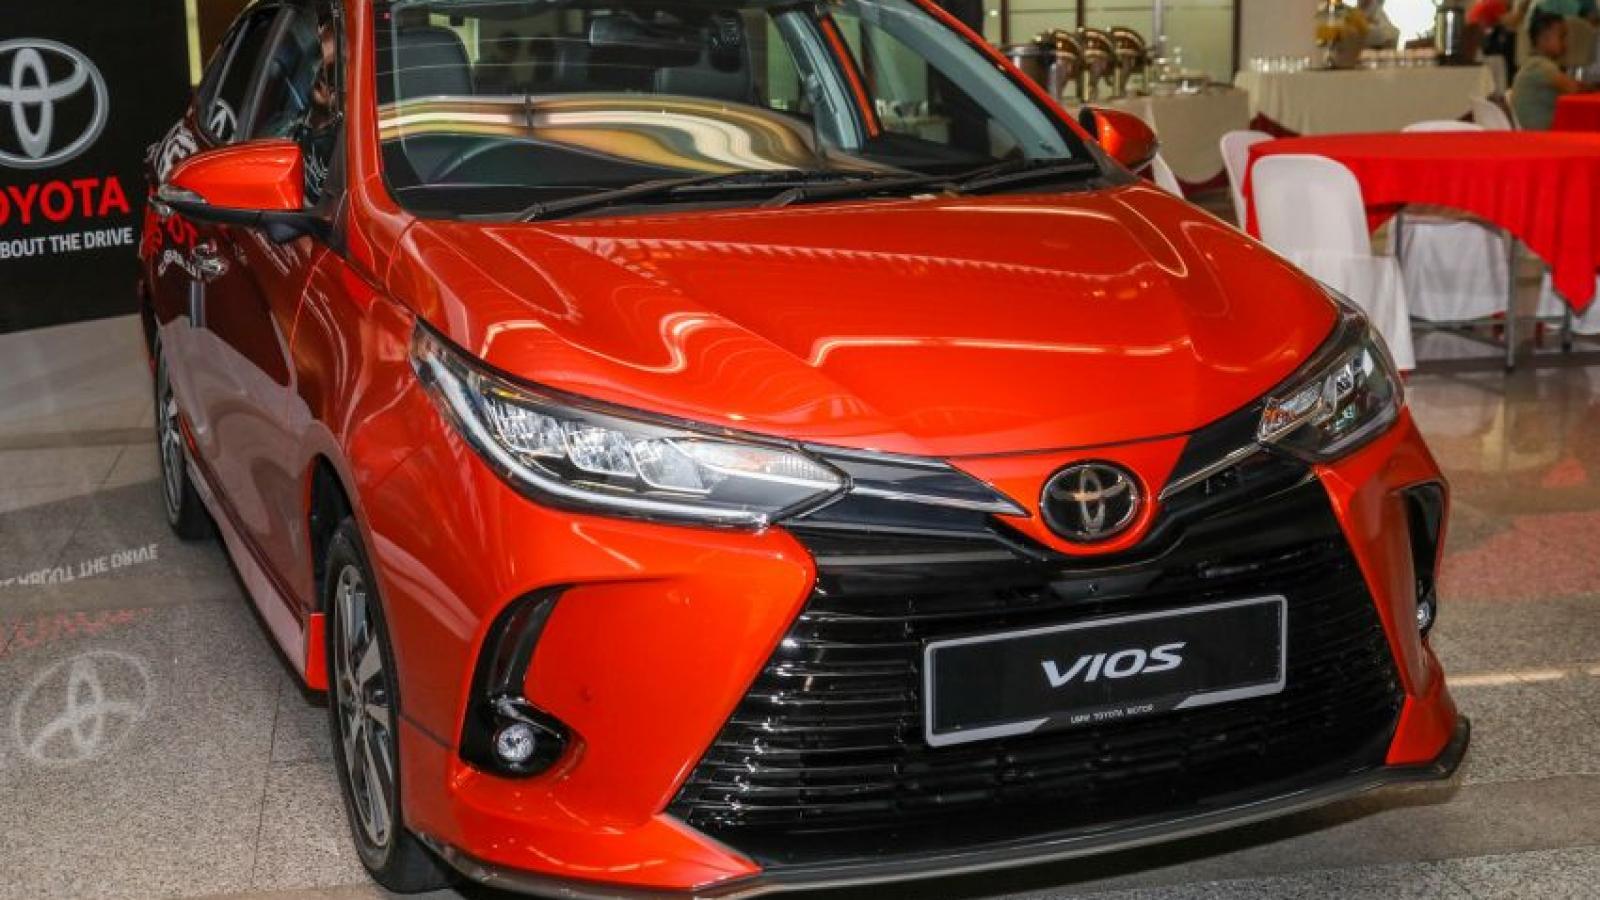 Khám phá Toyota Vios bản 2021 vừa ra mắt